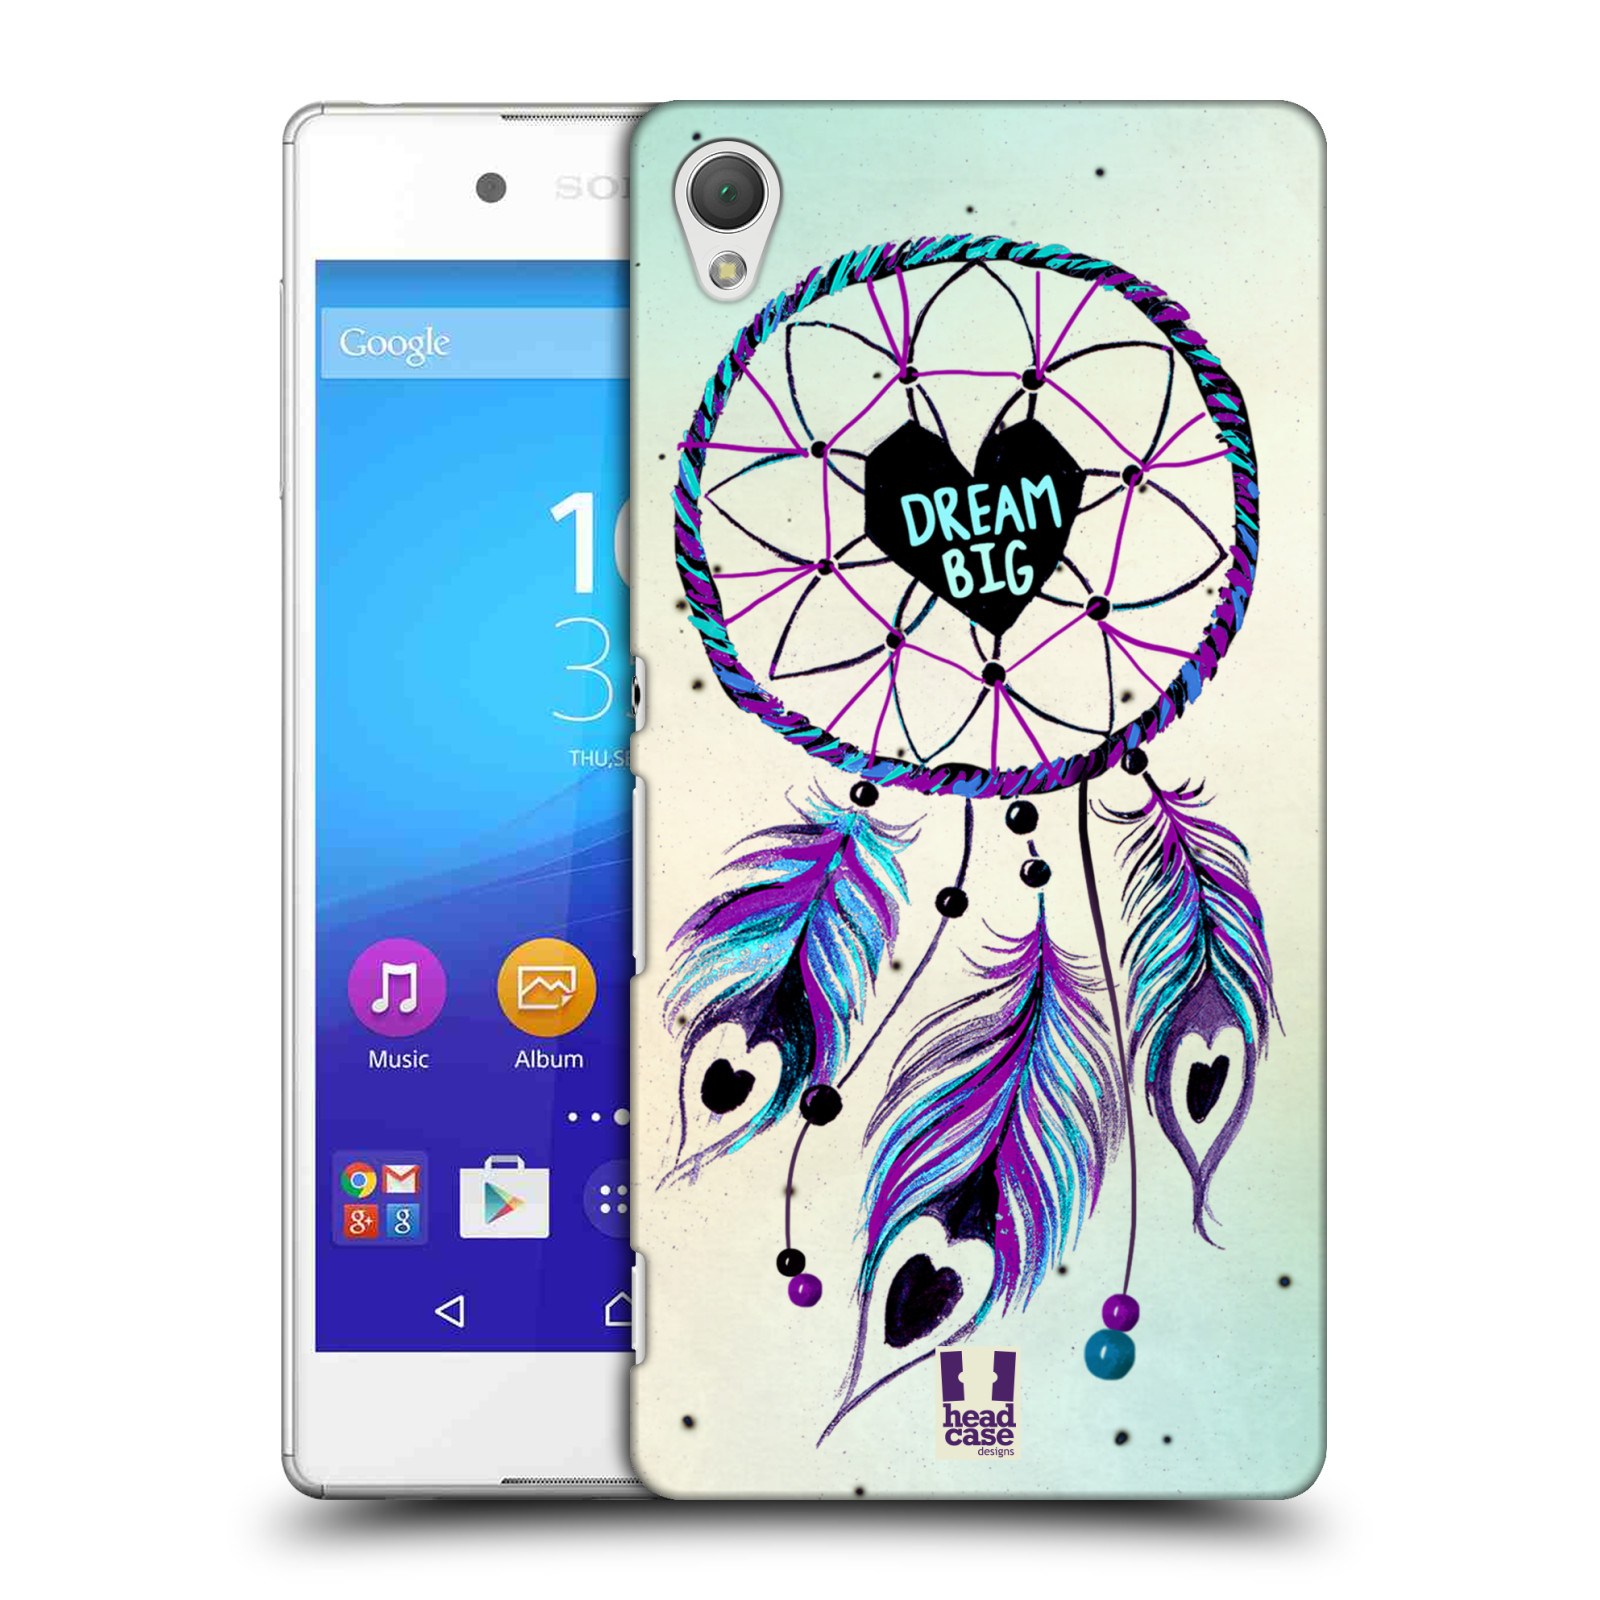 Plastové pouzdro na mobil Sony Xperia Z3+ (Plus) HEAD CASE Lapač Assorted Dream Big Srdce (Kryt či obal na mobilní telefon Sony Xperia Z3+ a Sony Xperia Z4 )